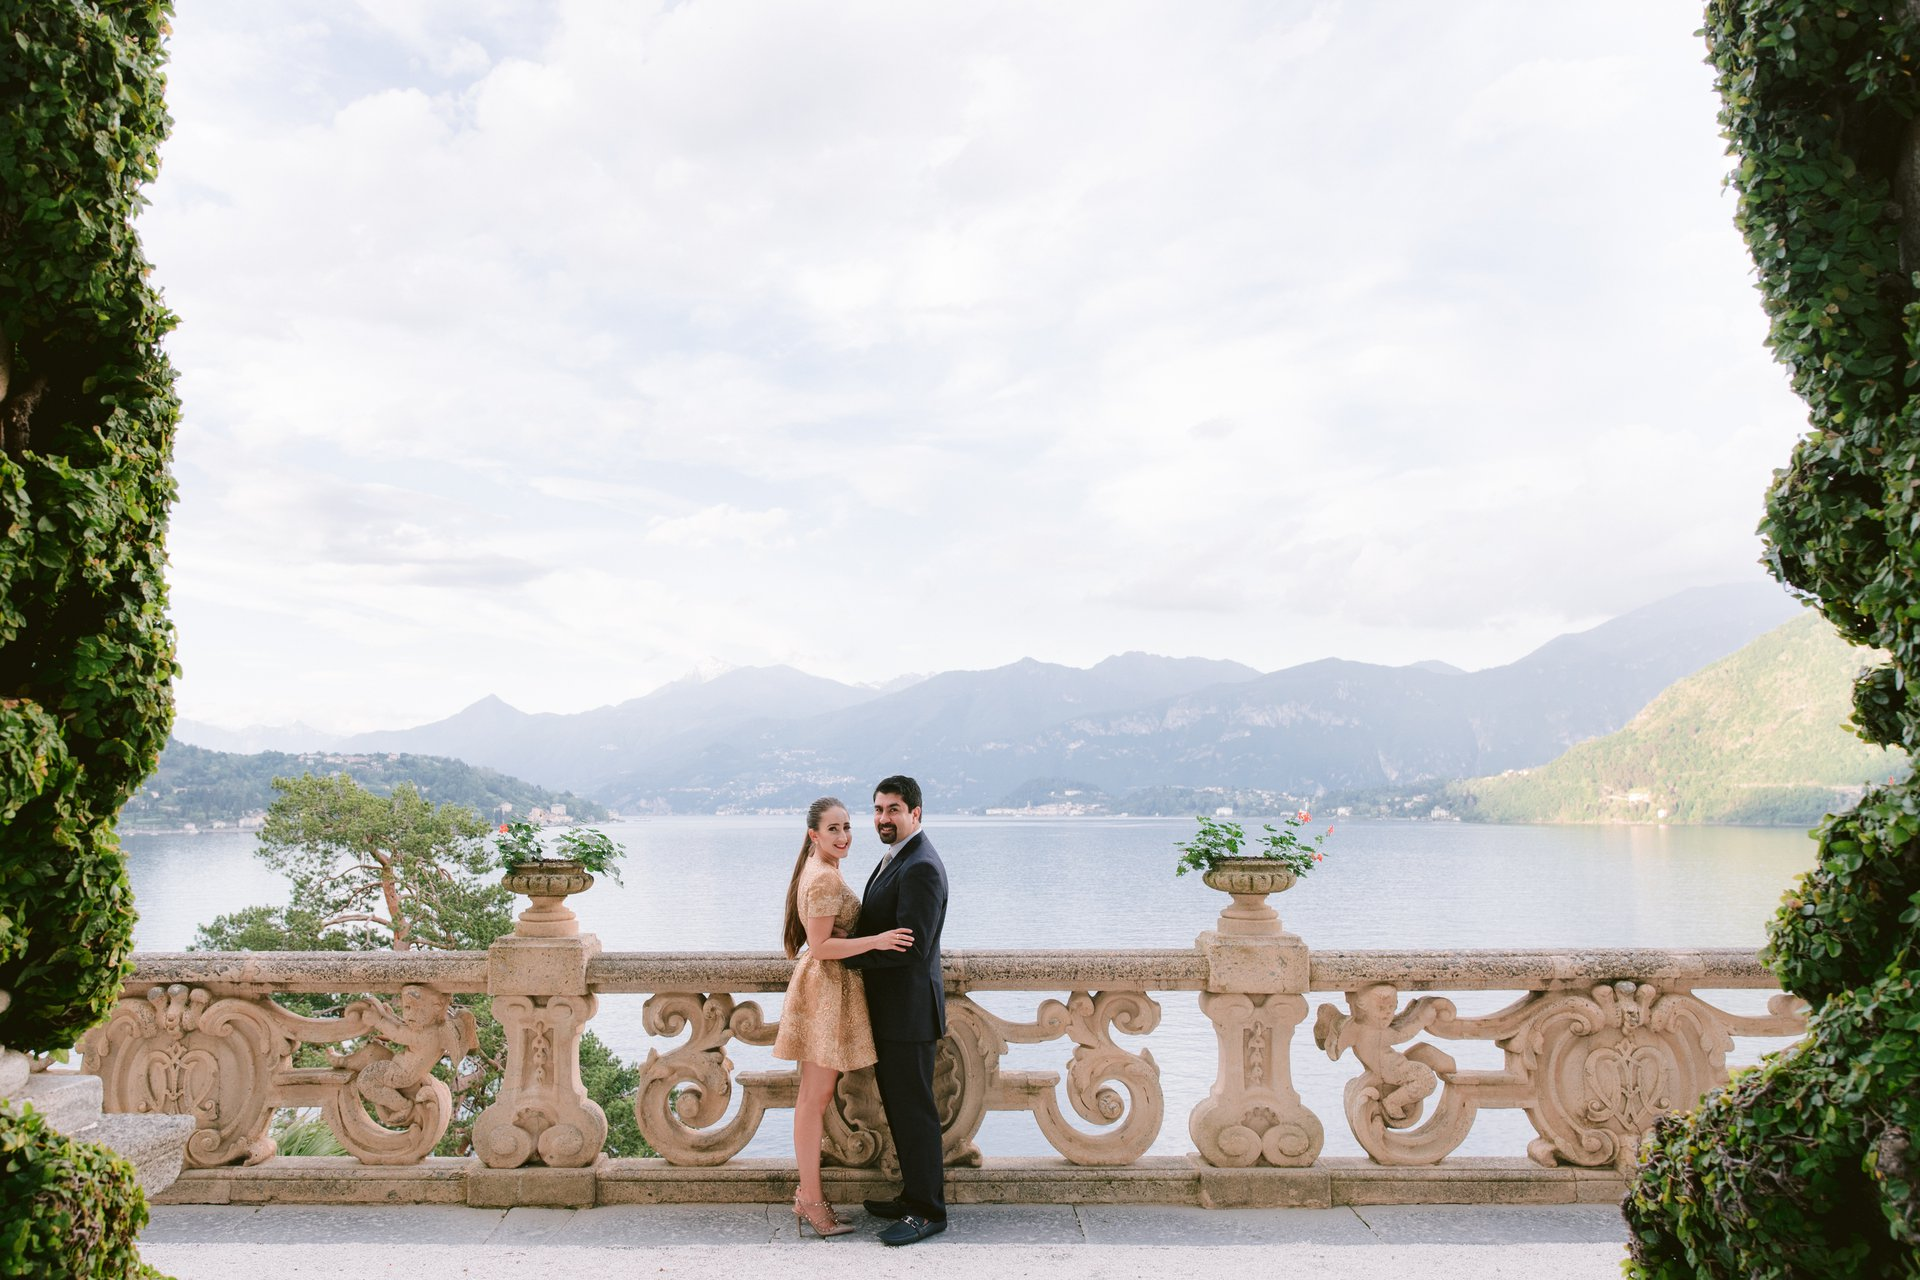 Lake Como-Italy-travel-story-Flytographer-4